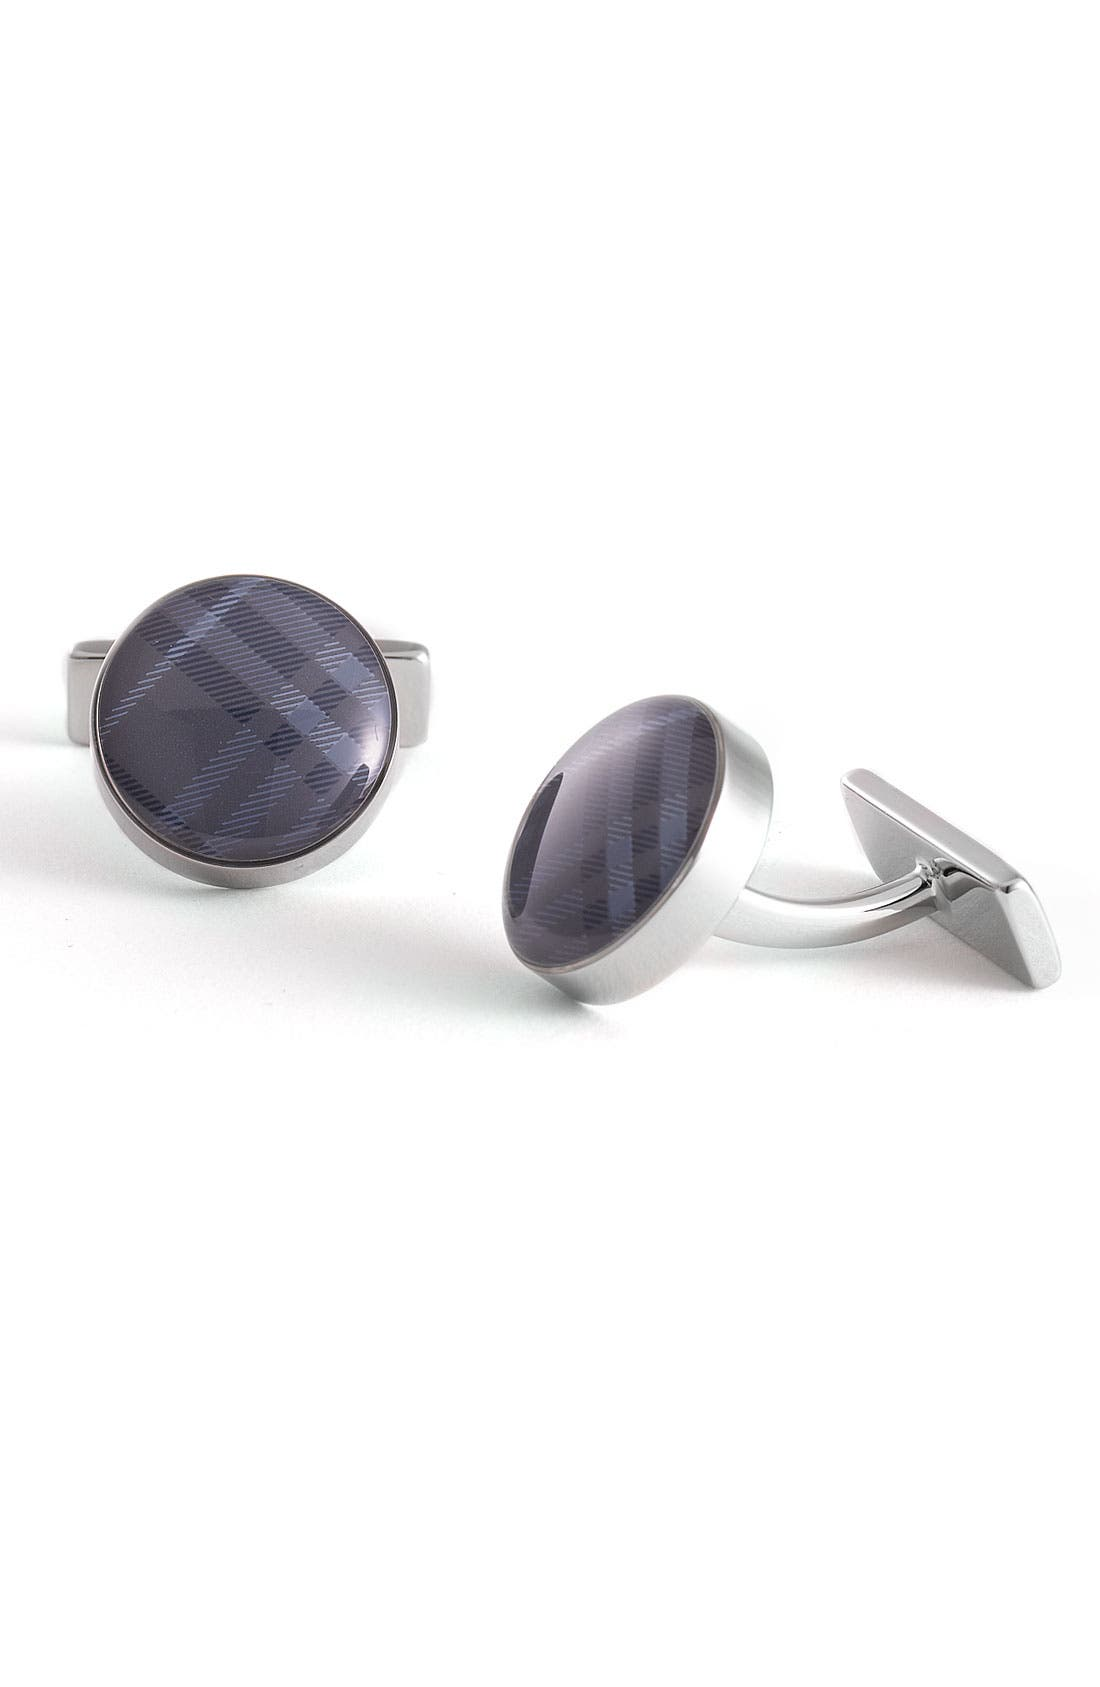 Main Image - Burberry Check Round Cuff Links